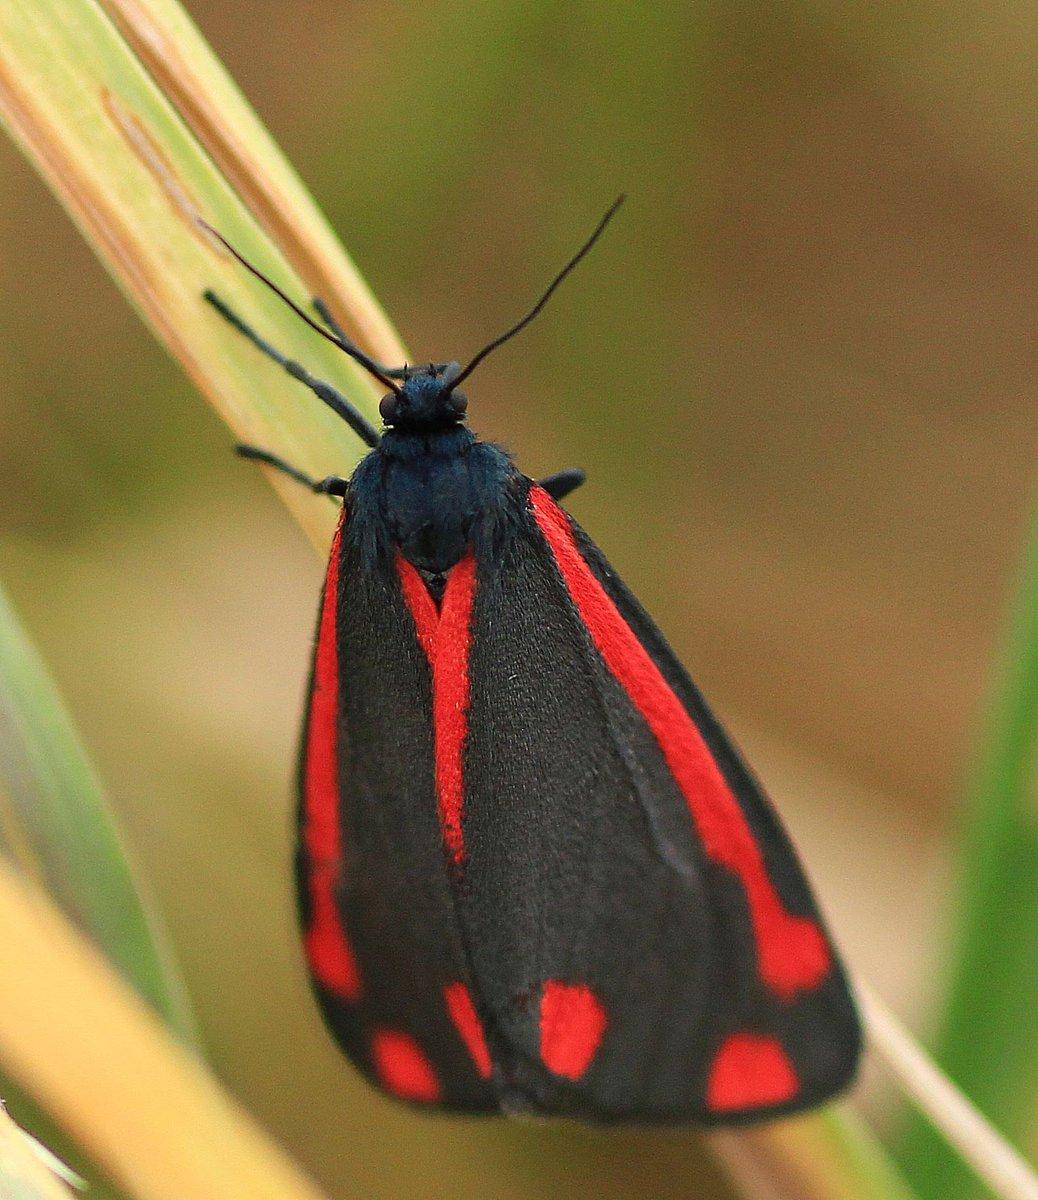 Cinnabar moth - and the next generation - for #worldmothsweekend